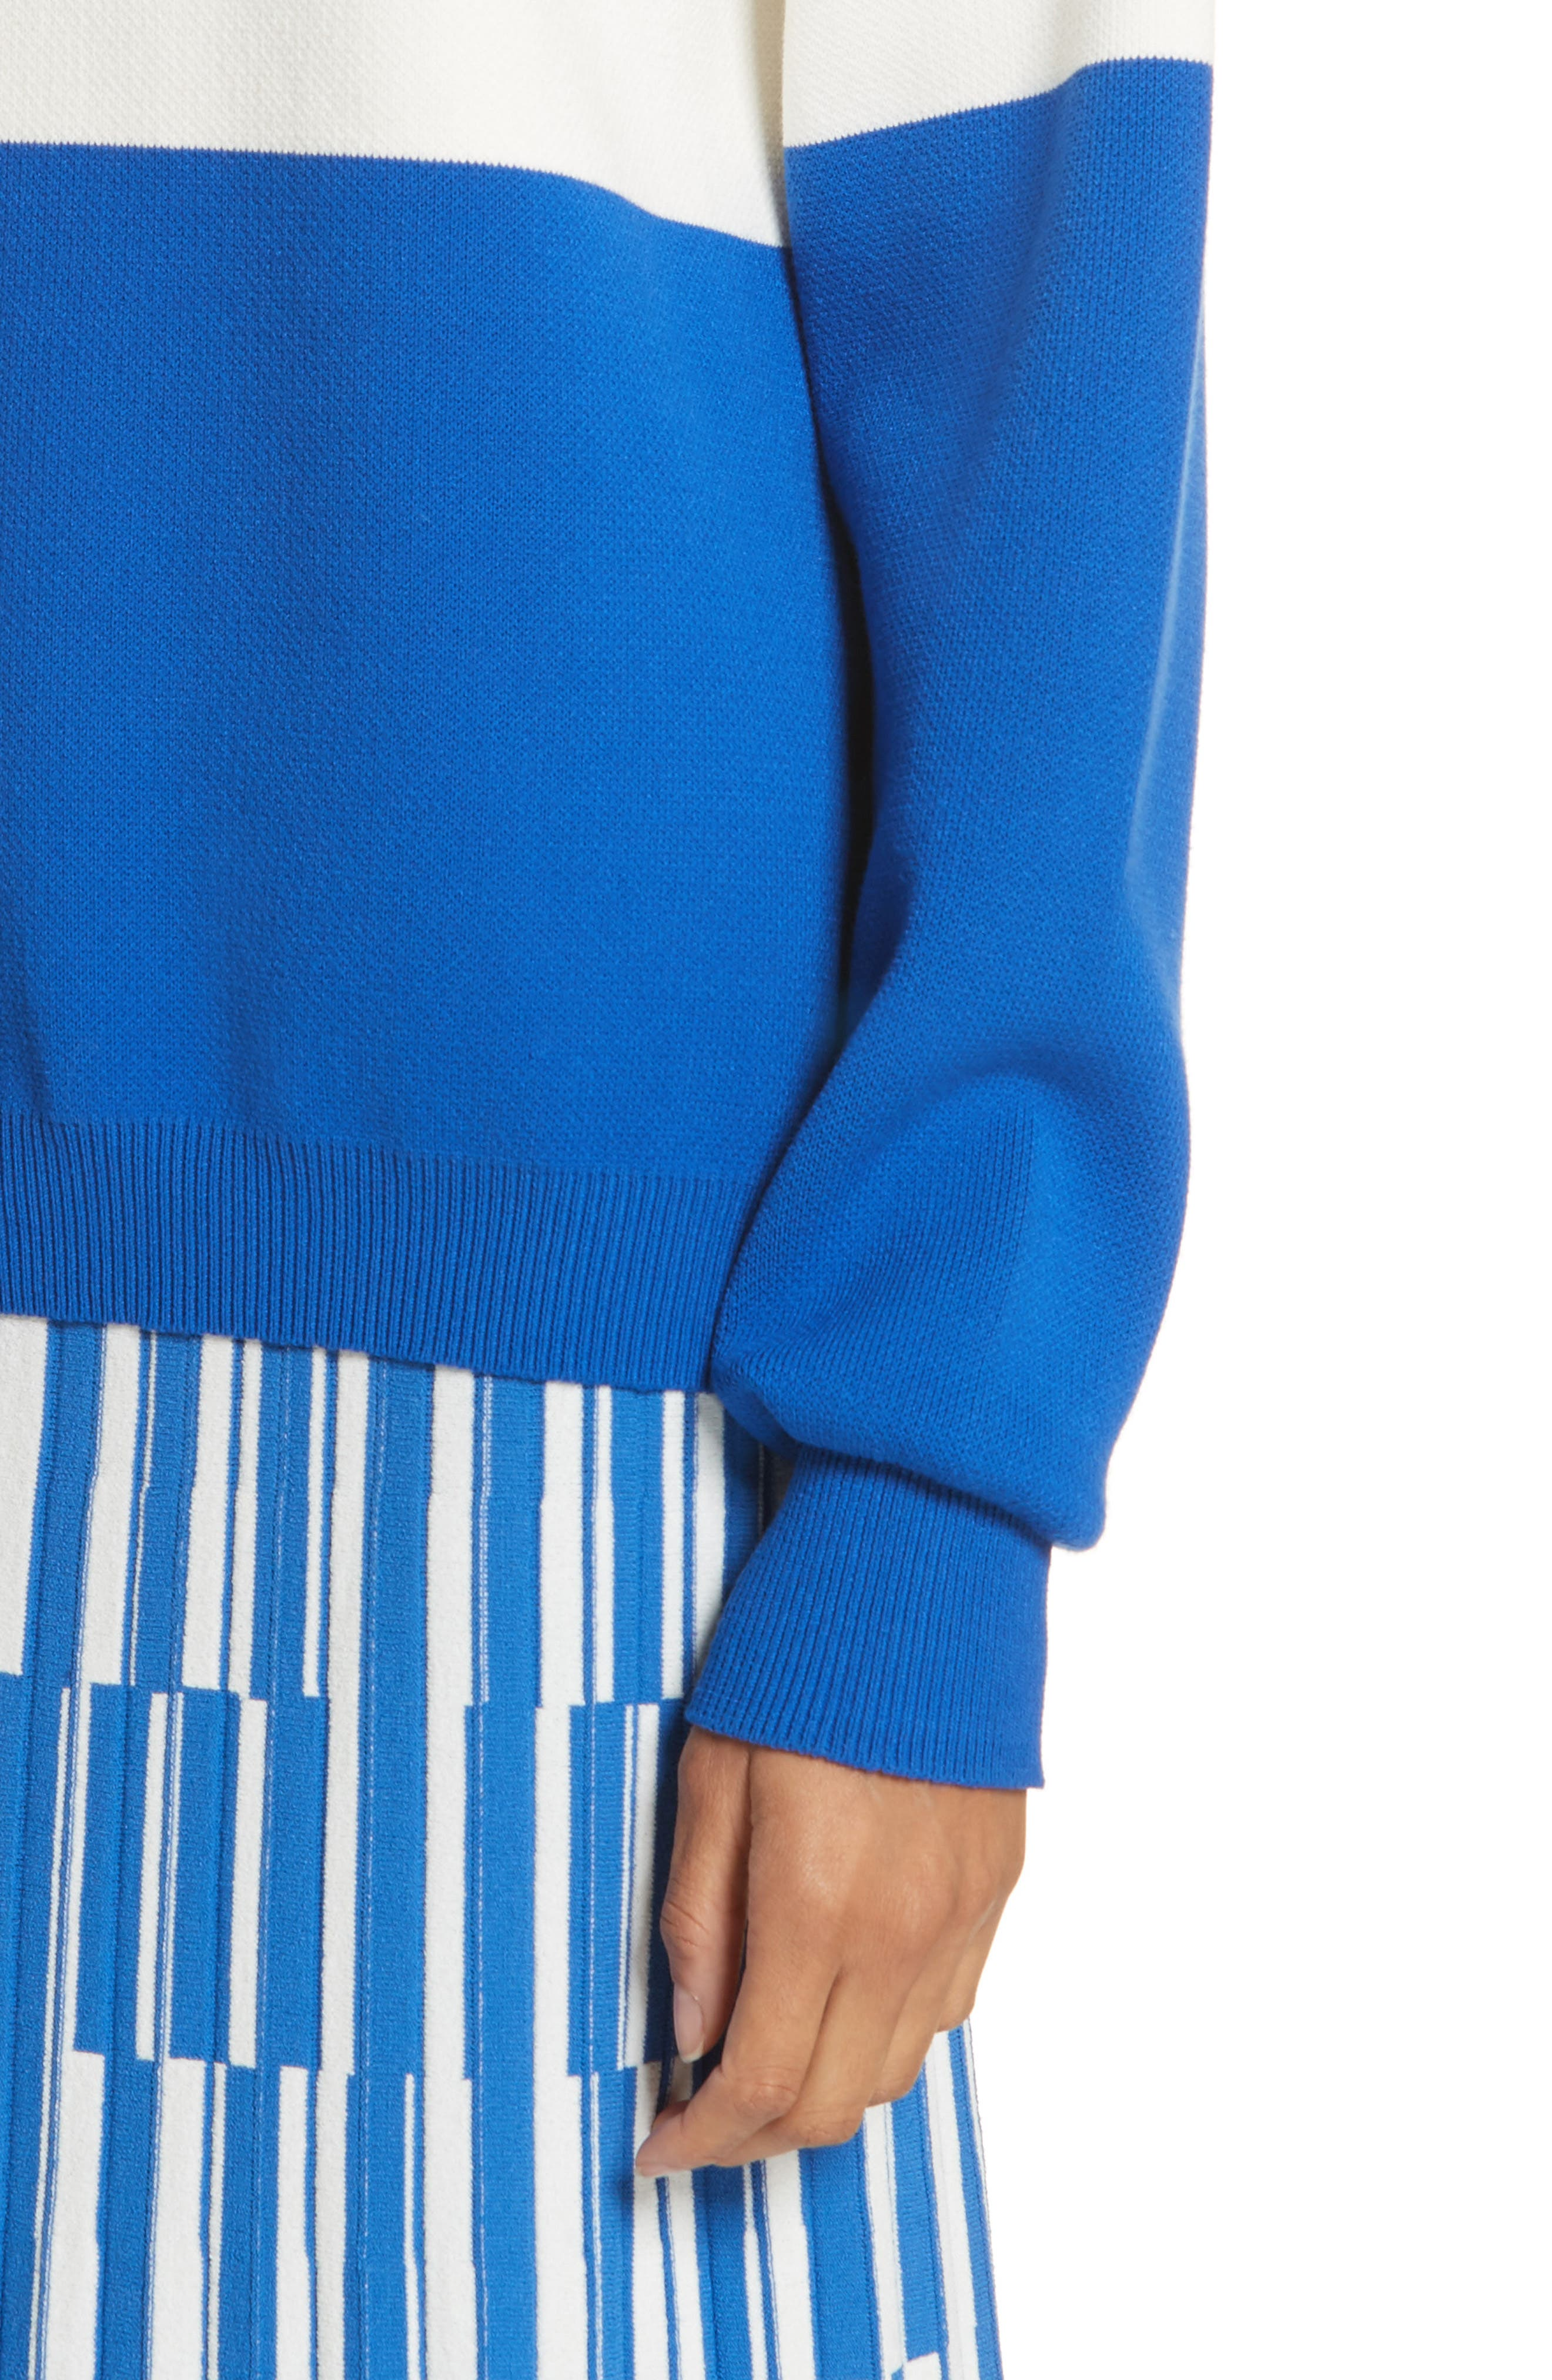 Colorblock Raglan Sweater,                             Alternate thumbnail 5, color,                             Snow White/ Slalom Blue